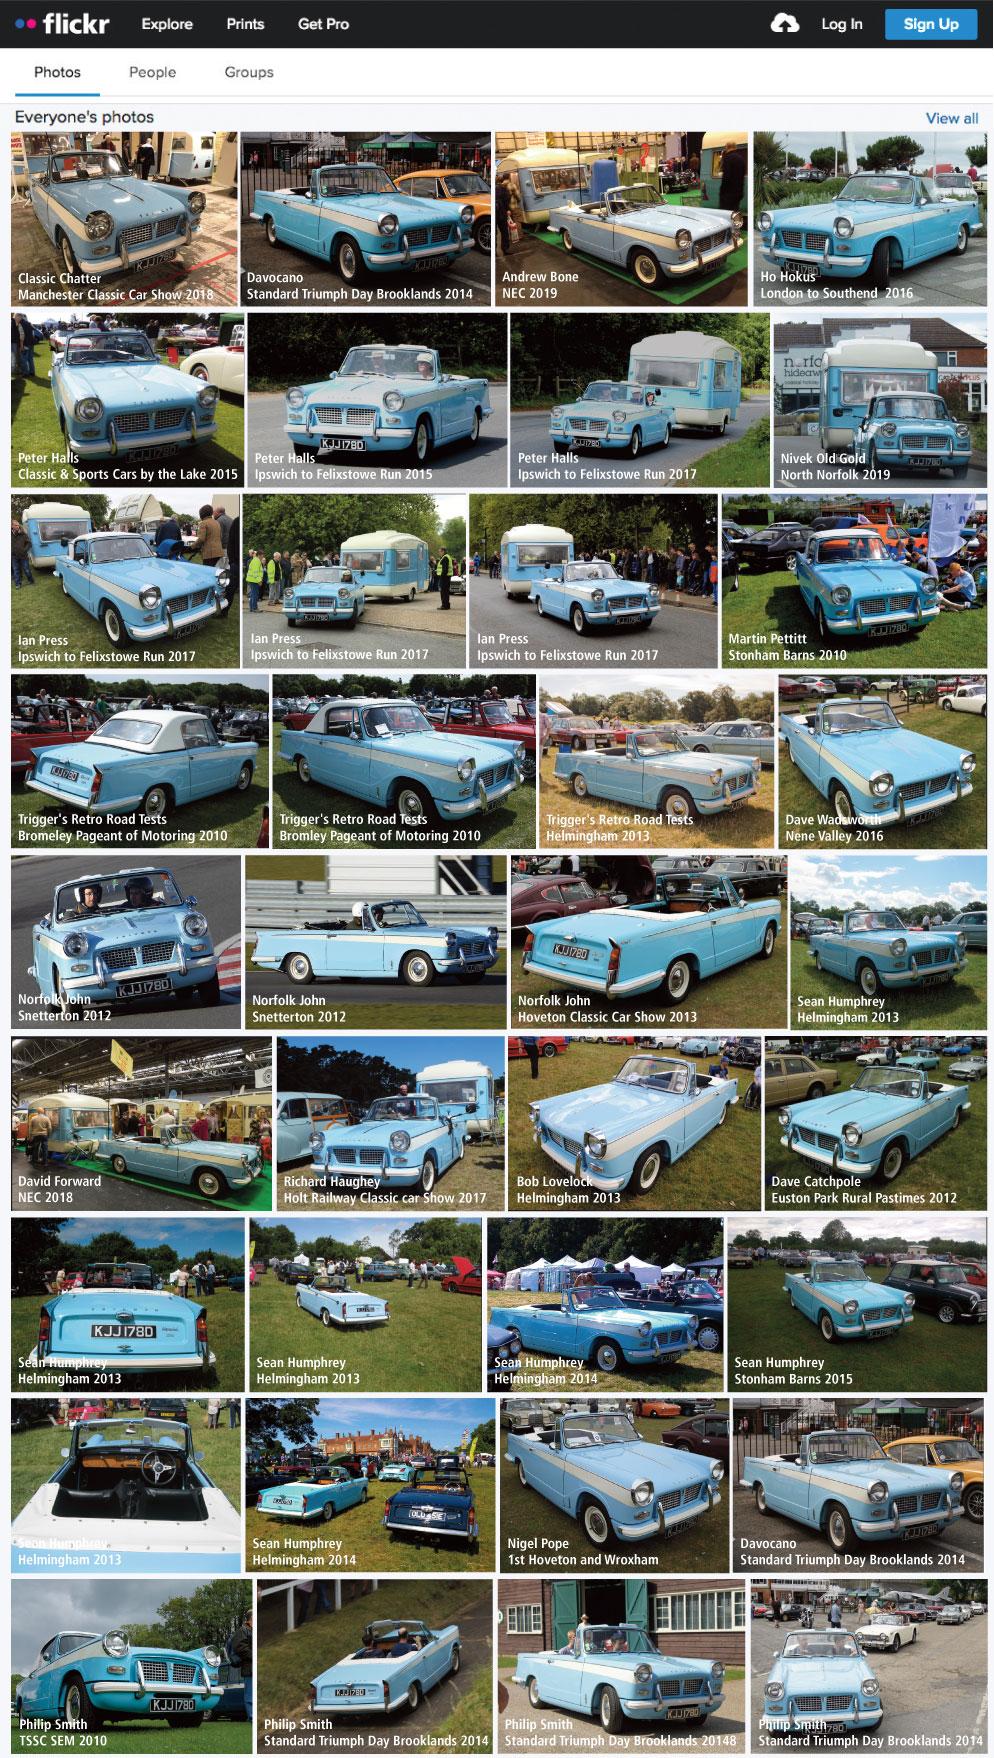 Flickr images of Triumph Herald KJJ 178D